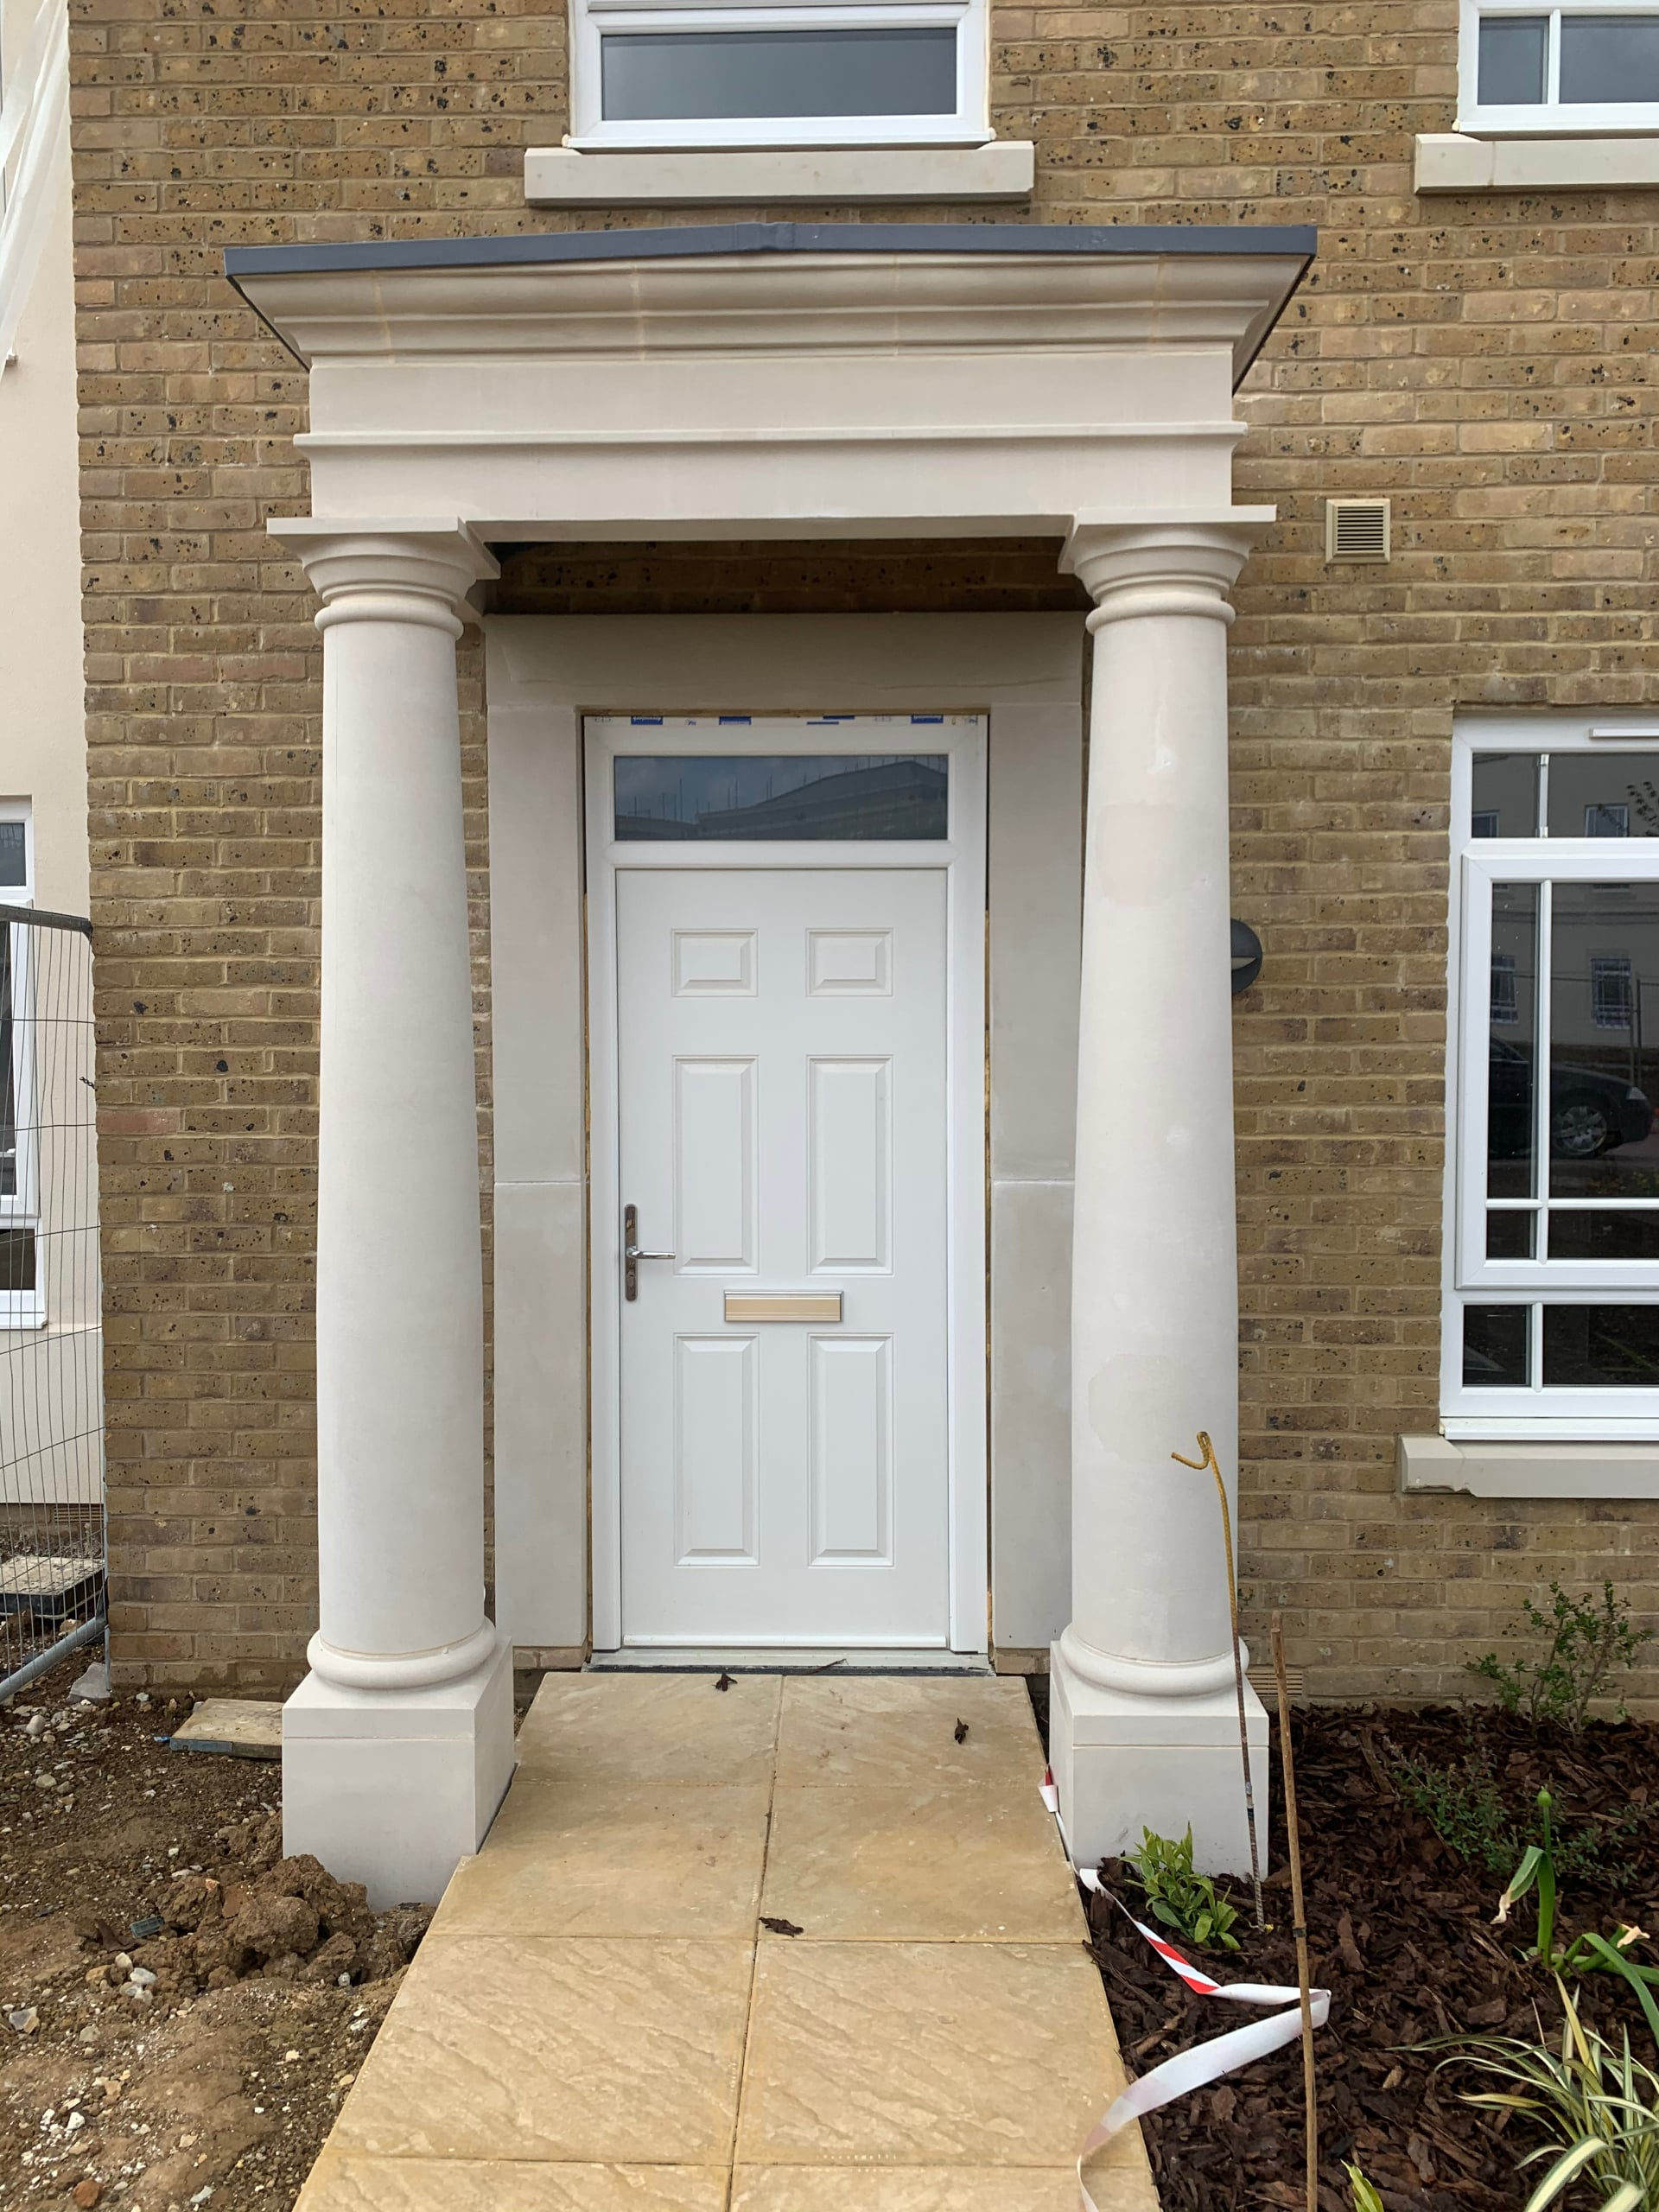 Make A Grand Entrance with Bespoke Stone Portico Designs Porches - Malling Masonry